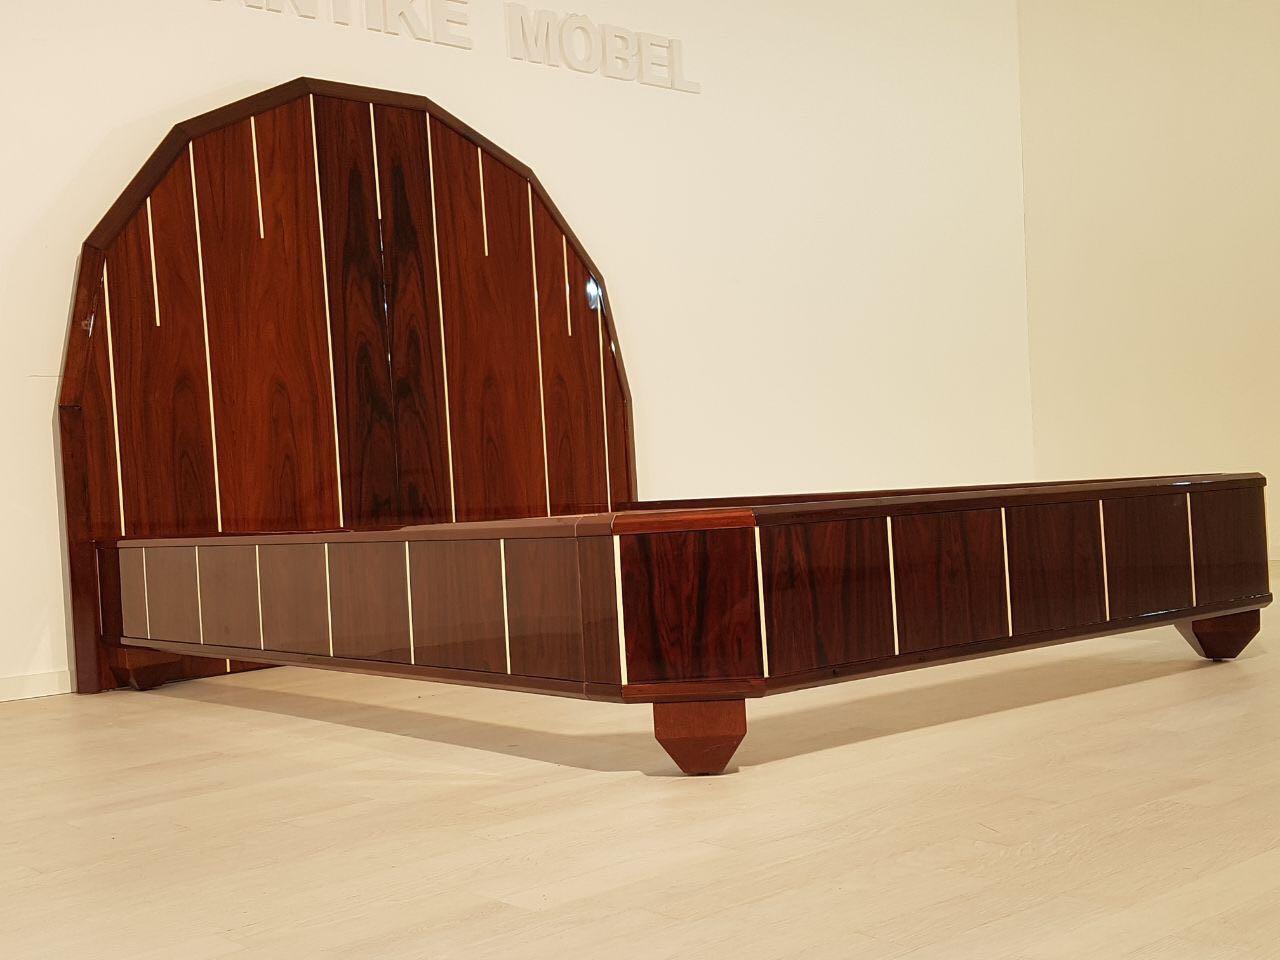 art deco bett aus palisanderholz original antike m bel. Black Bedroom Furniture Sets. Home Design Ideas